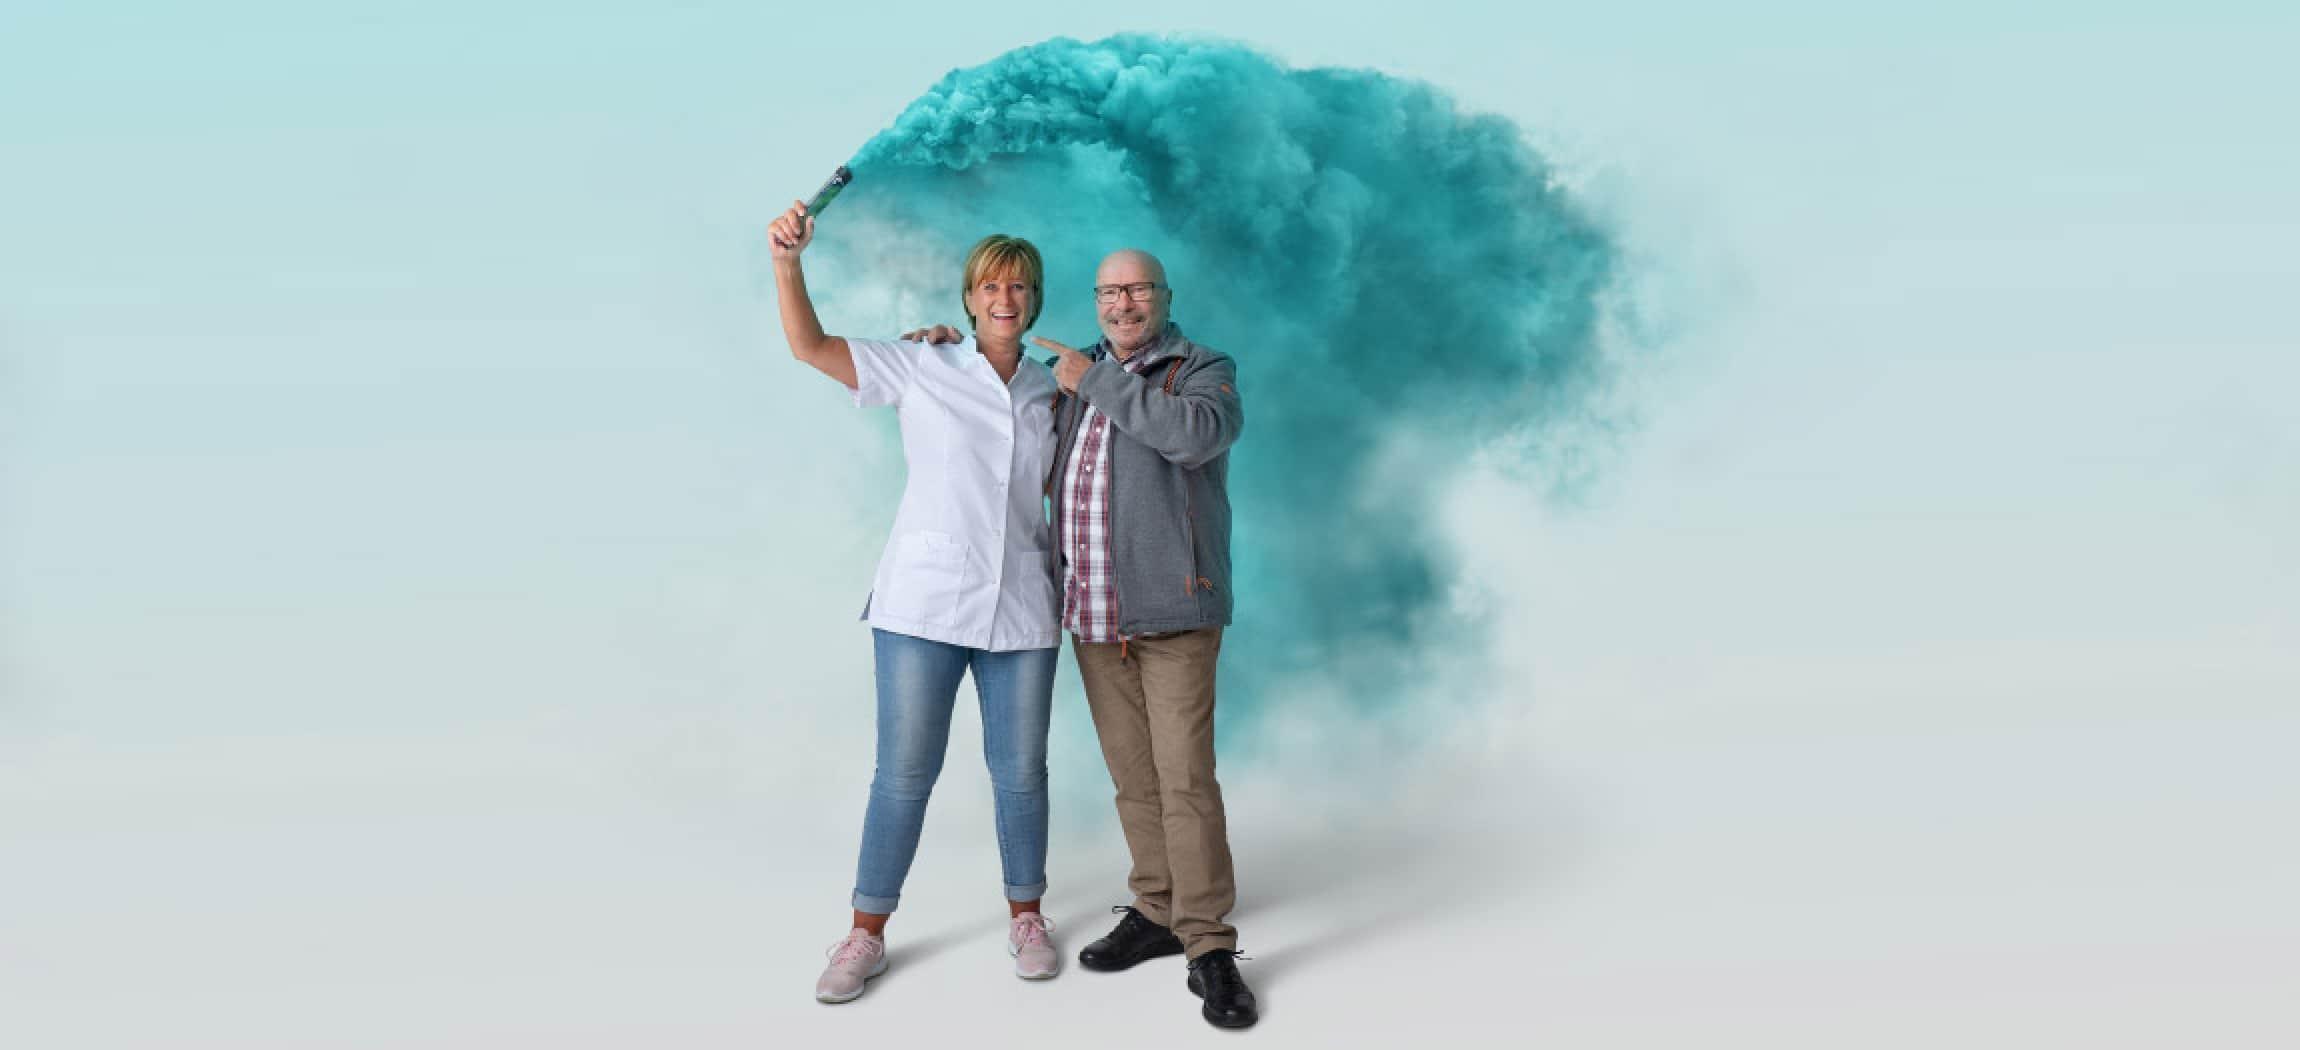 Jeanette verzorgende IG met oudere man en fakkel blauwe rook voor wervingscampagne Amstelring